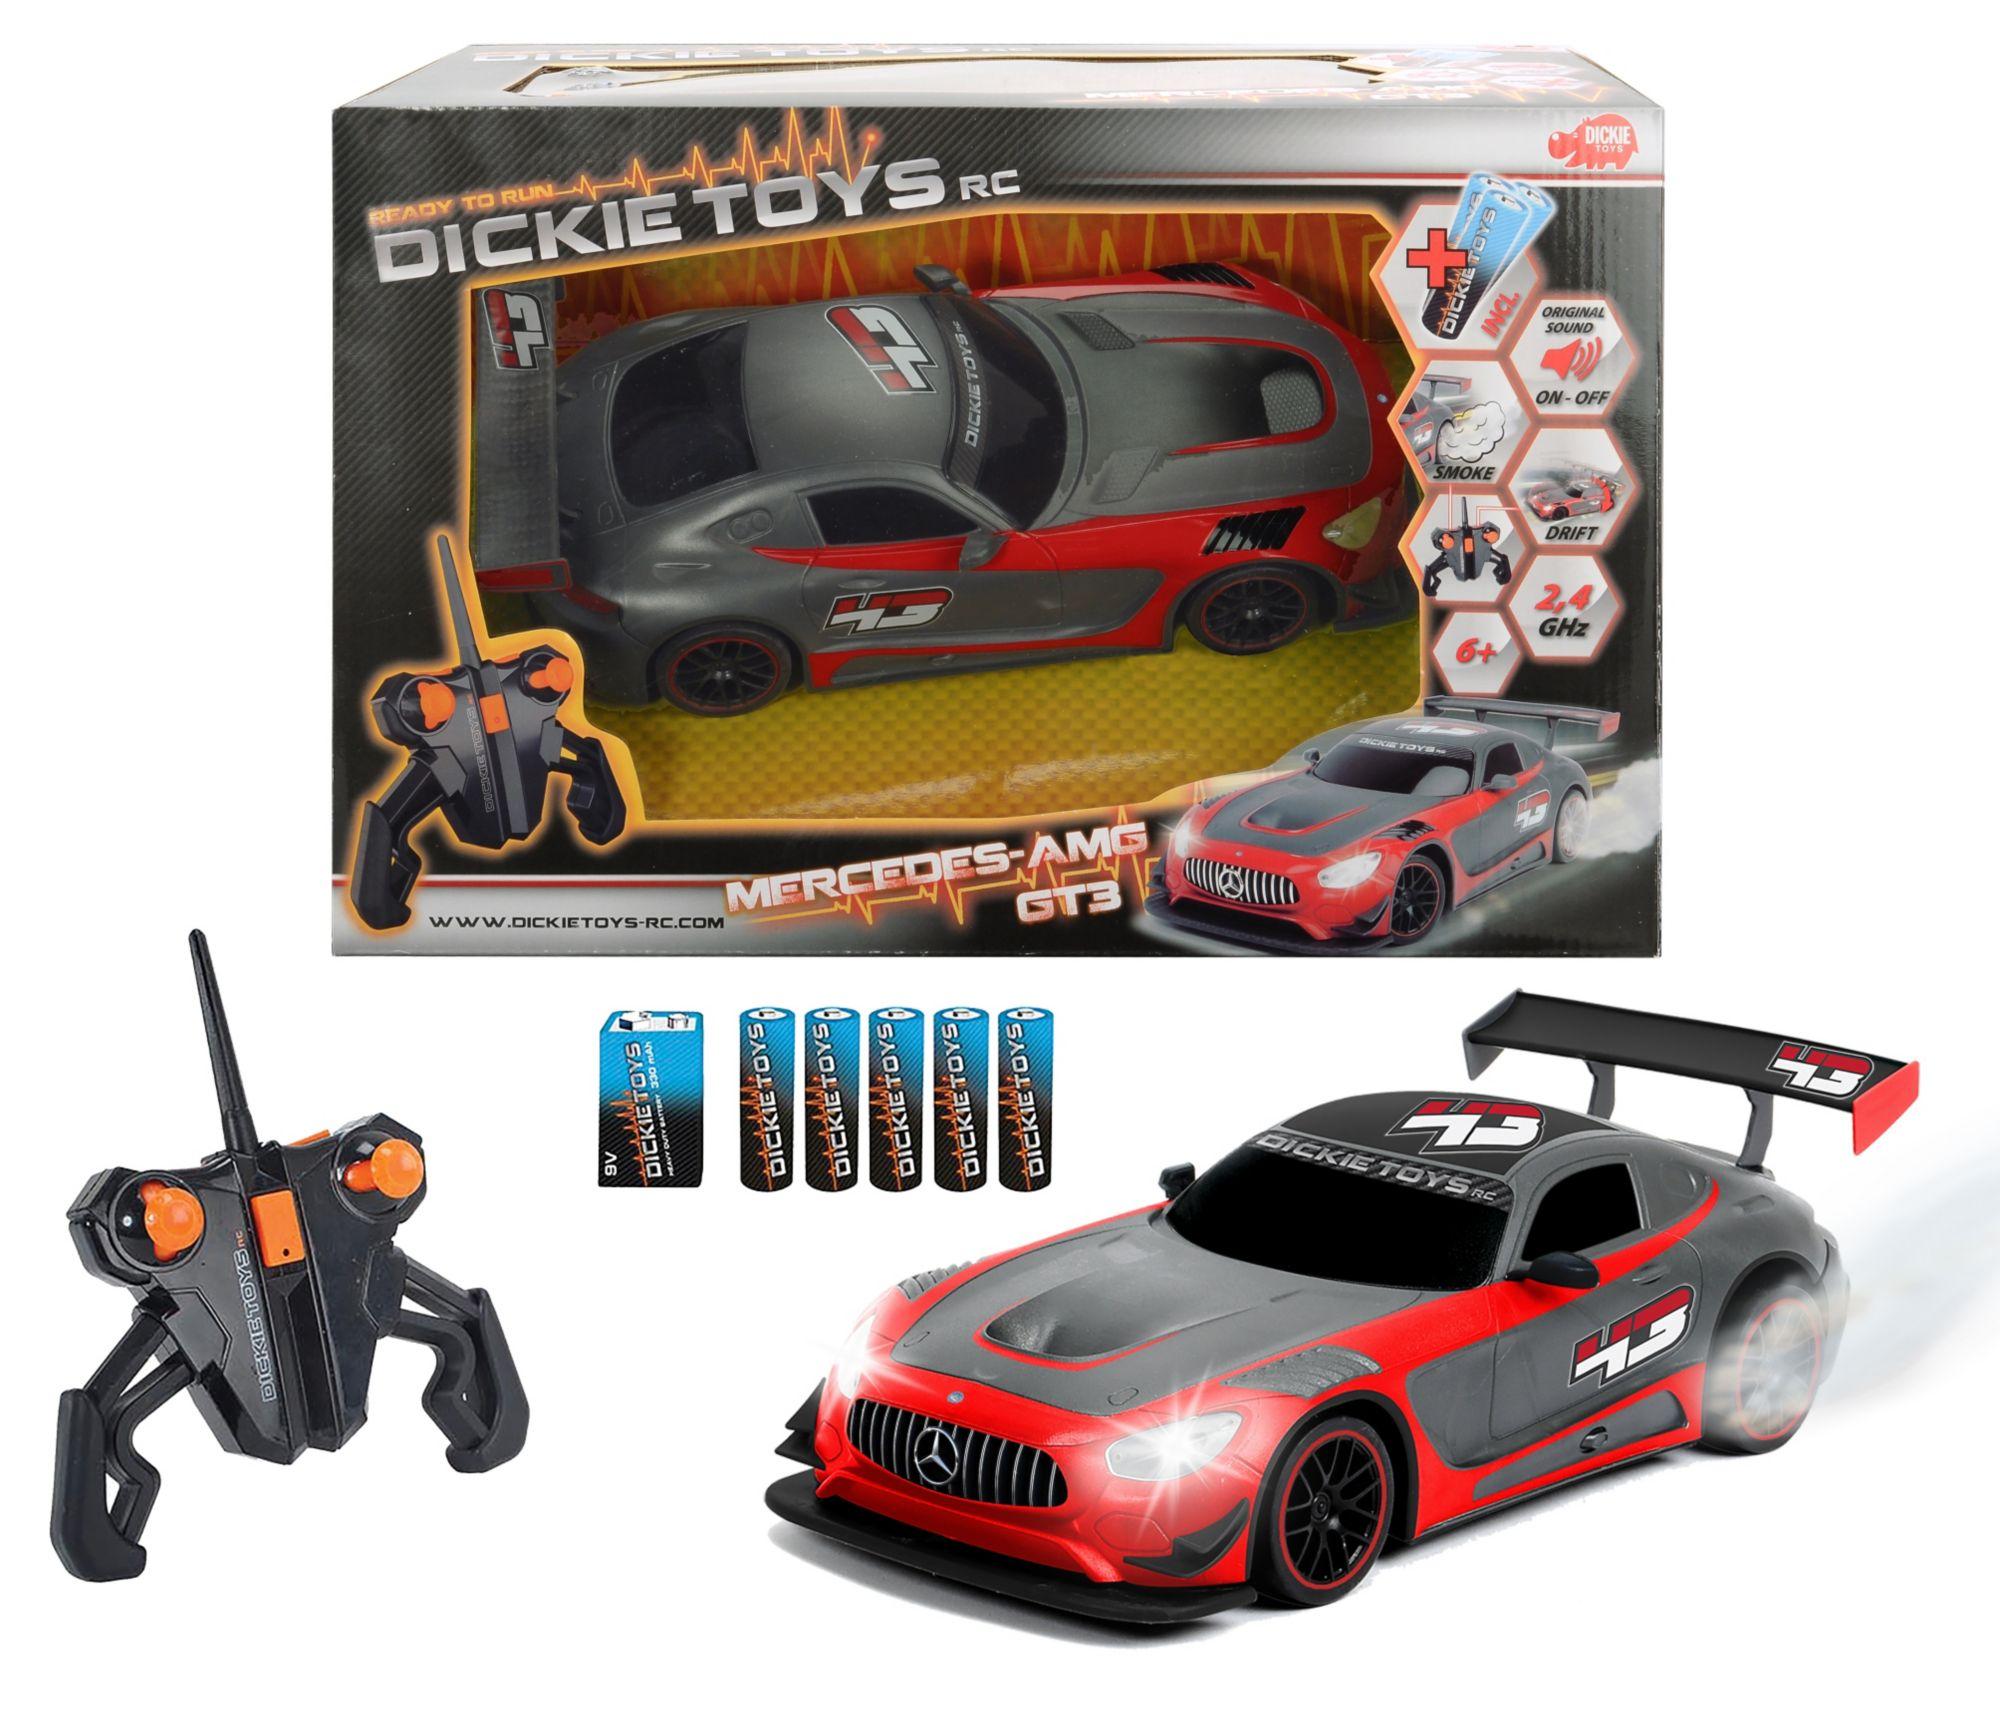 DICKIE TOYS Dickie Toys RC Komplett Set, »Mercedes AMG GT3 2,4 GHz 1:16 Grau«